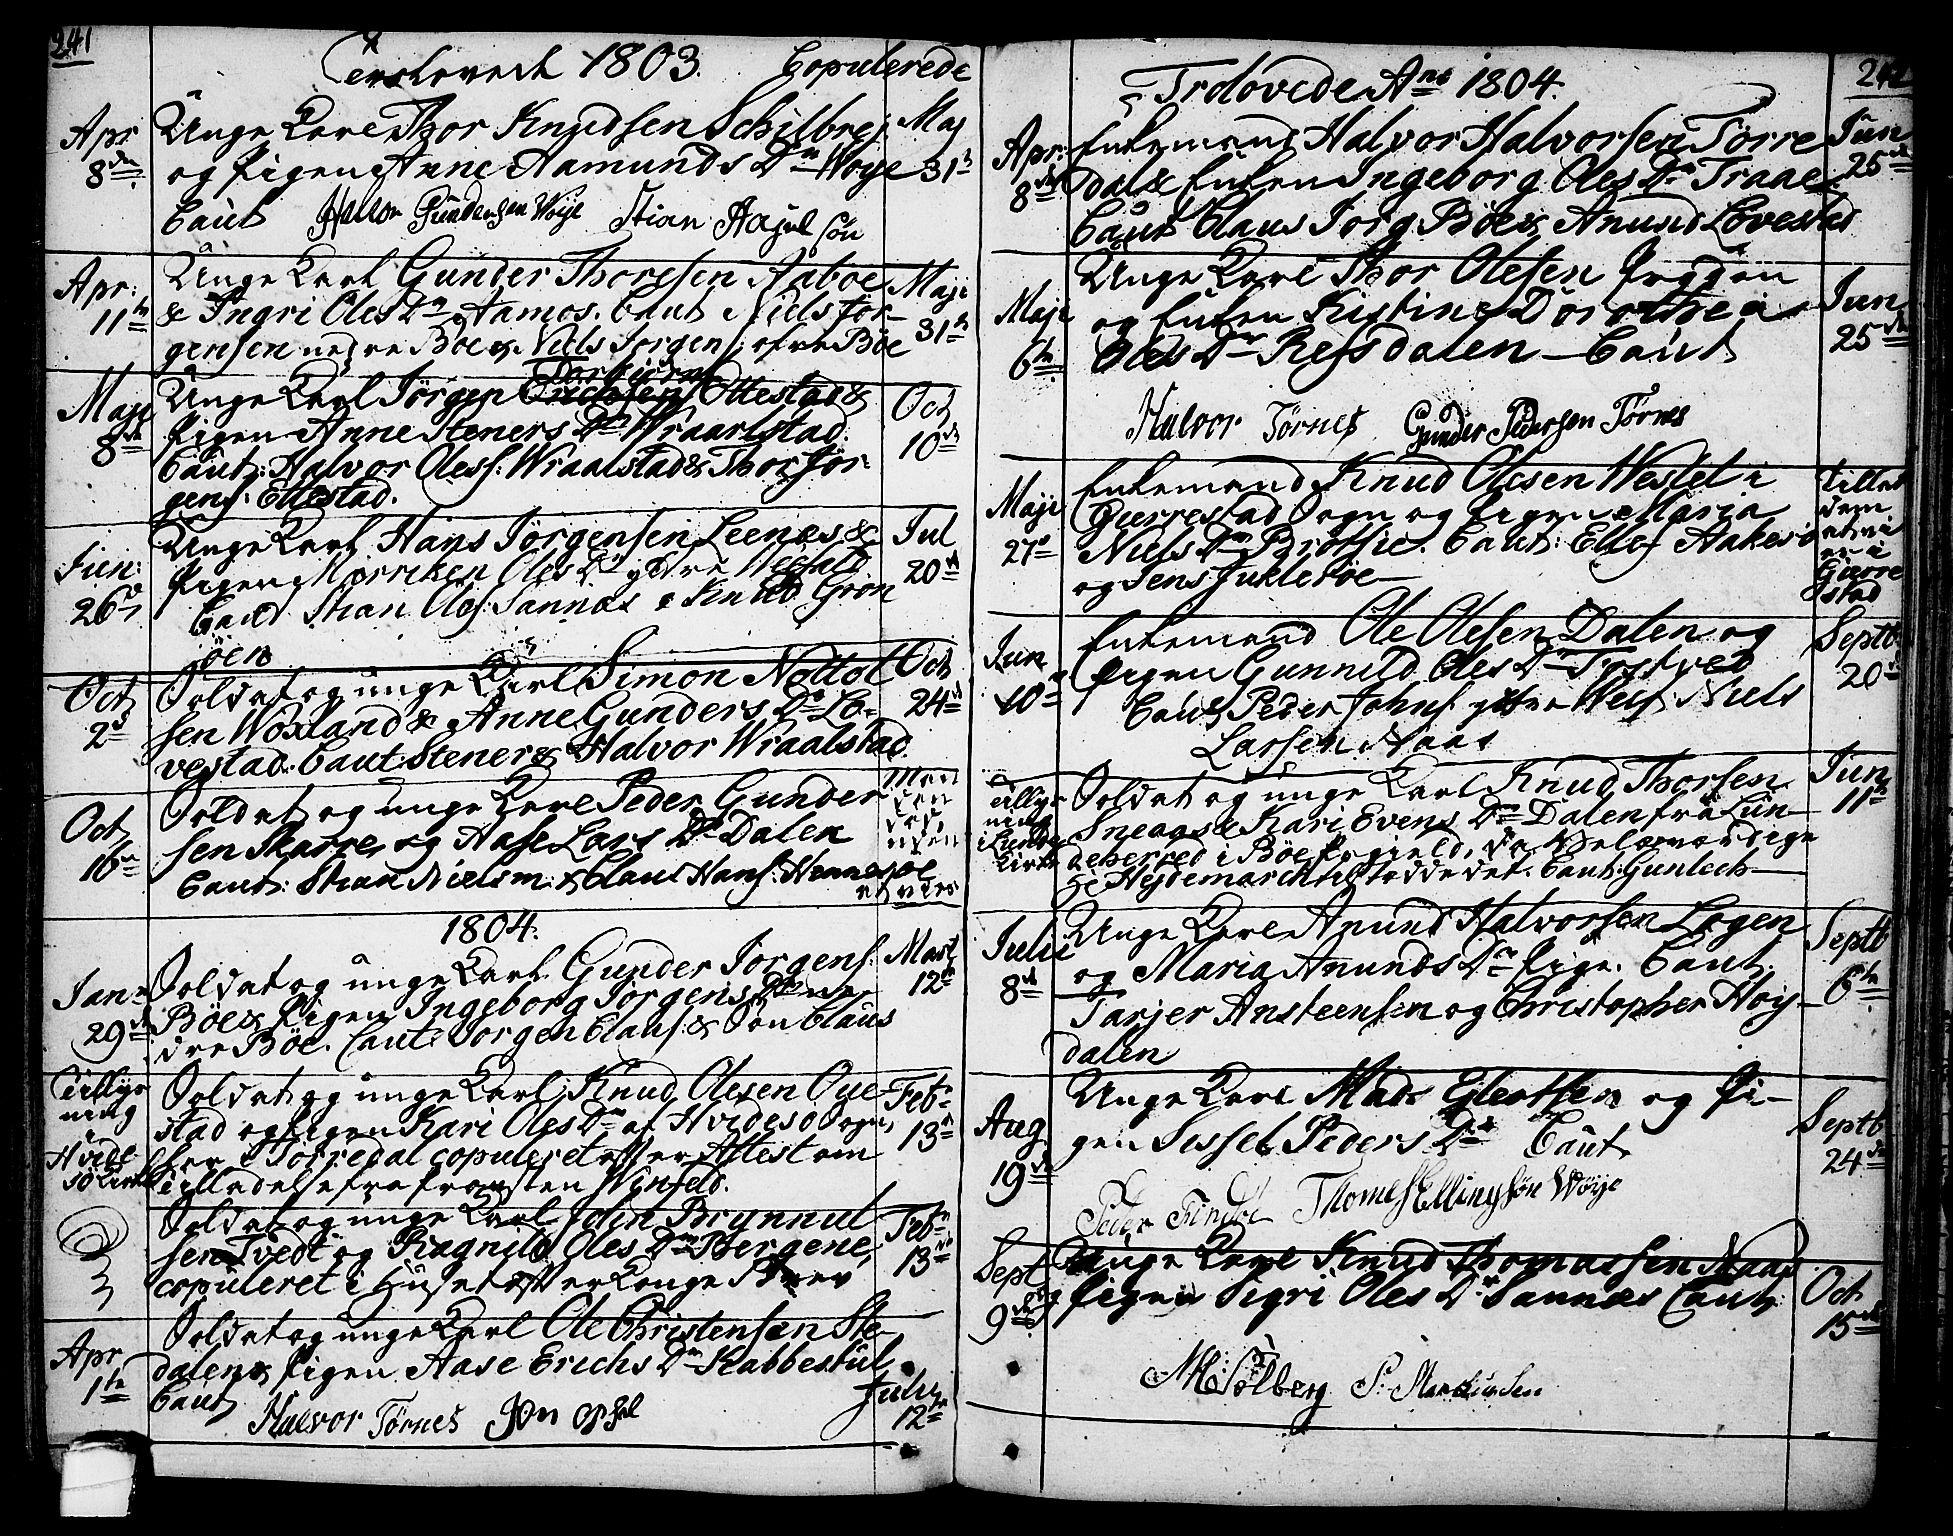 SAKO, Drangedal kirkebøker, F/Fa/L0003: Ministerialbok nr. 3, 1768-1814, s. 241-242